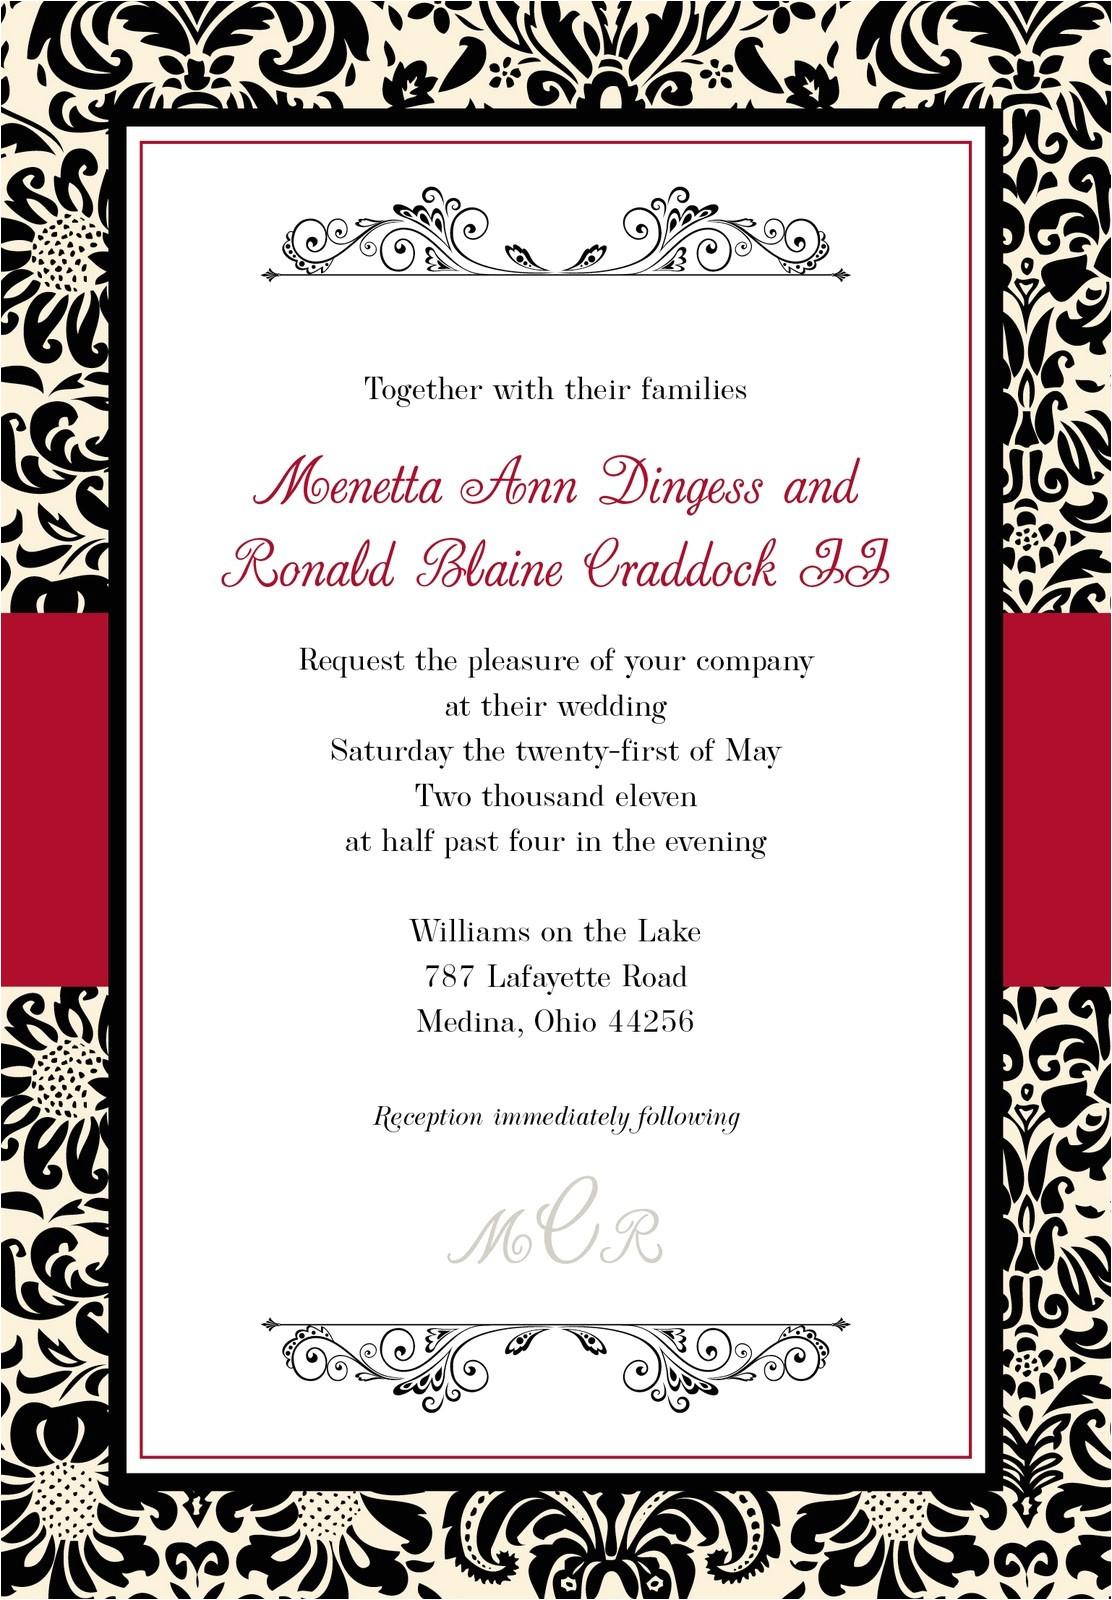 blank wedding invitation templates black and white